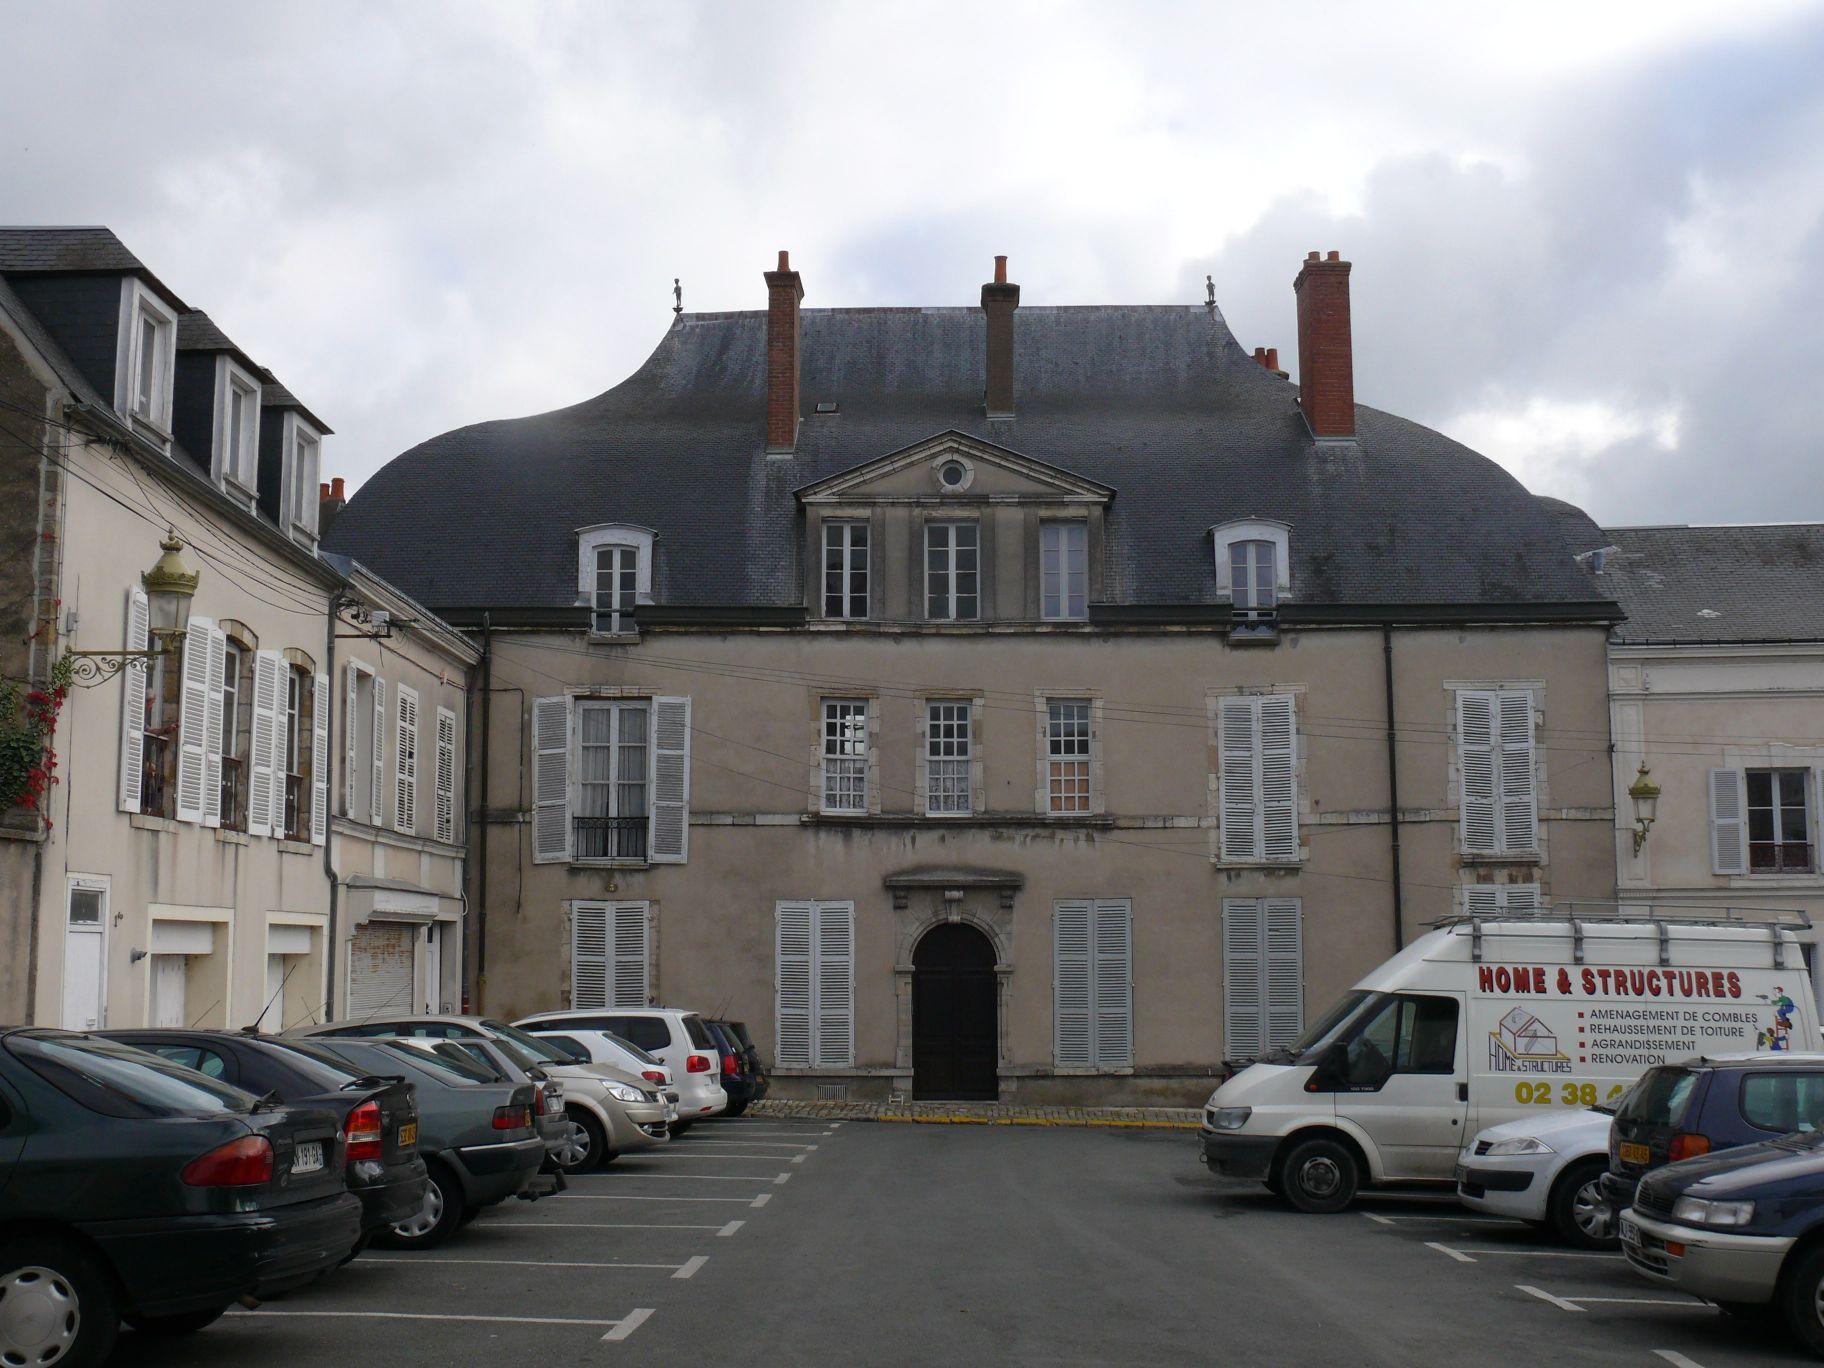 File:Pithiviers - Château de l'Ardoise.jpg - Wikimedia Commons